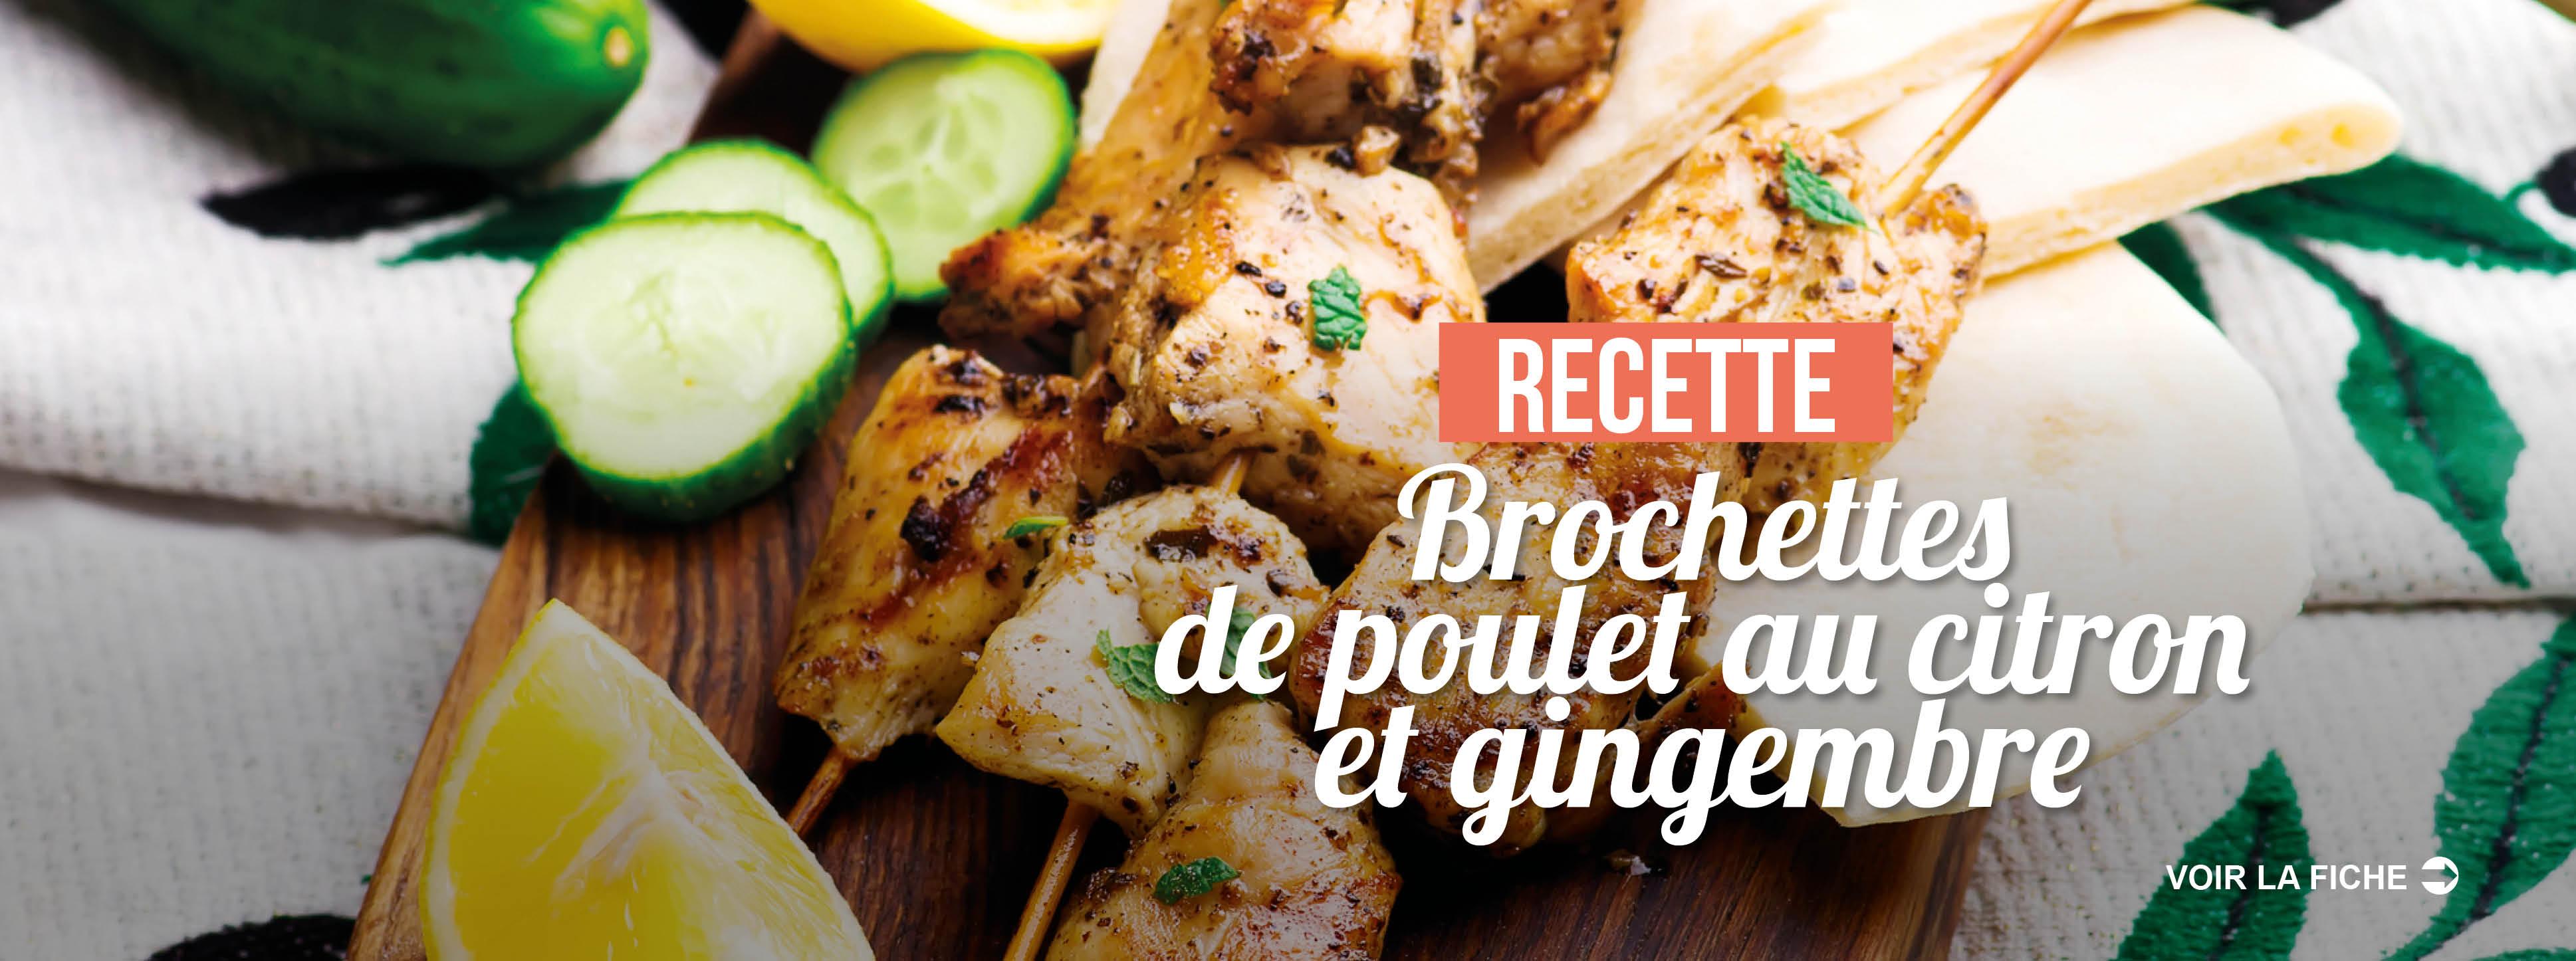 SLIDE-Accueil-_Les Brochettes_ok